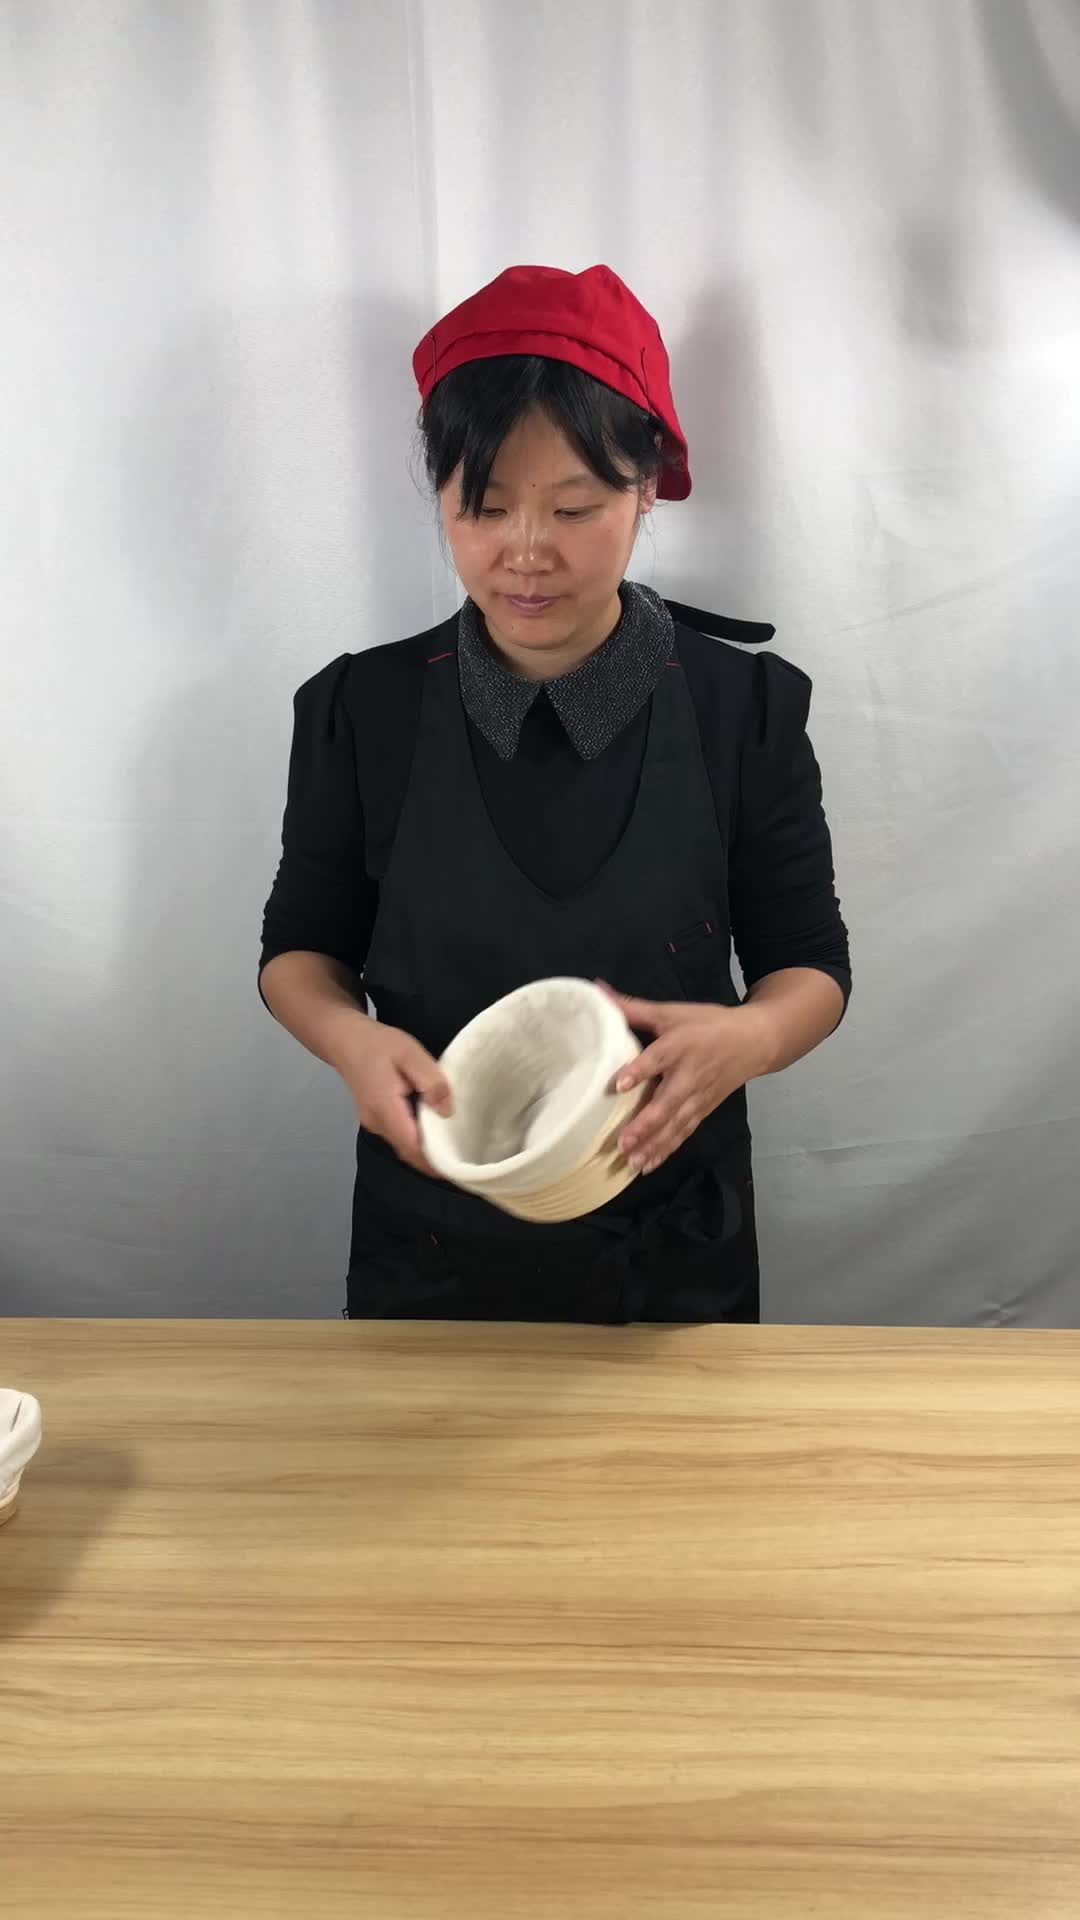 10inch Handmade banneton bread proofing basket set  Bread Bowl Rattan Banneton Bakery Tool baking sets